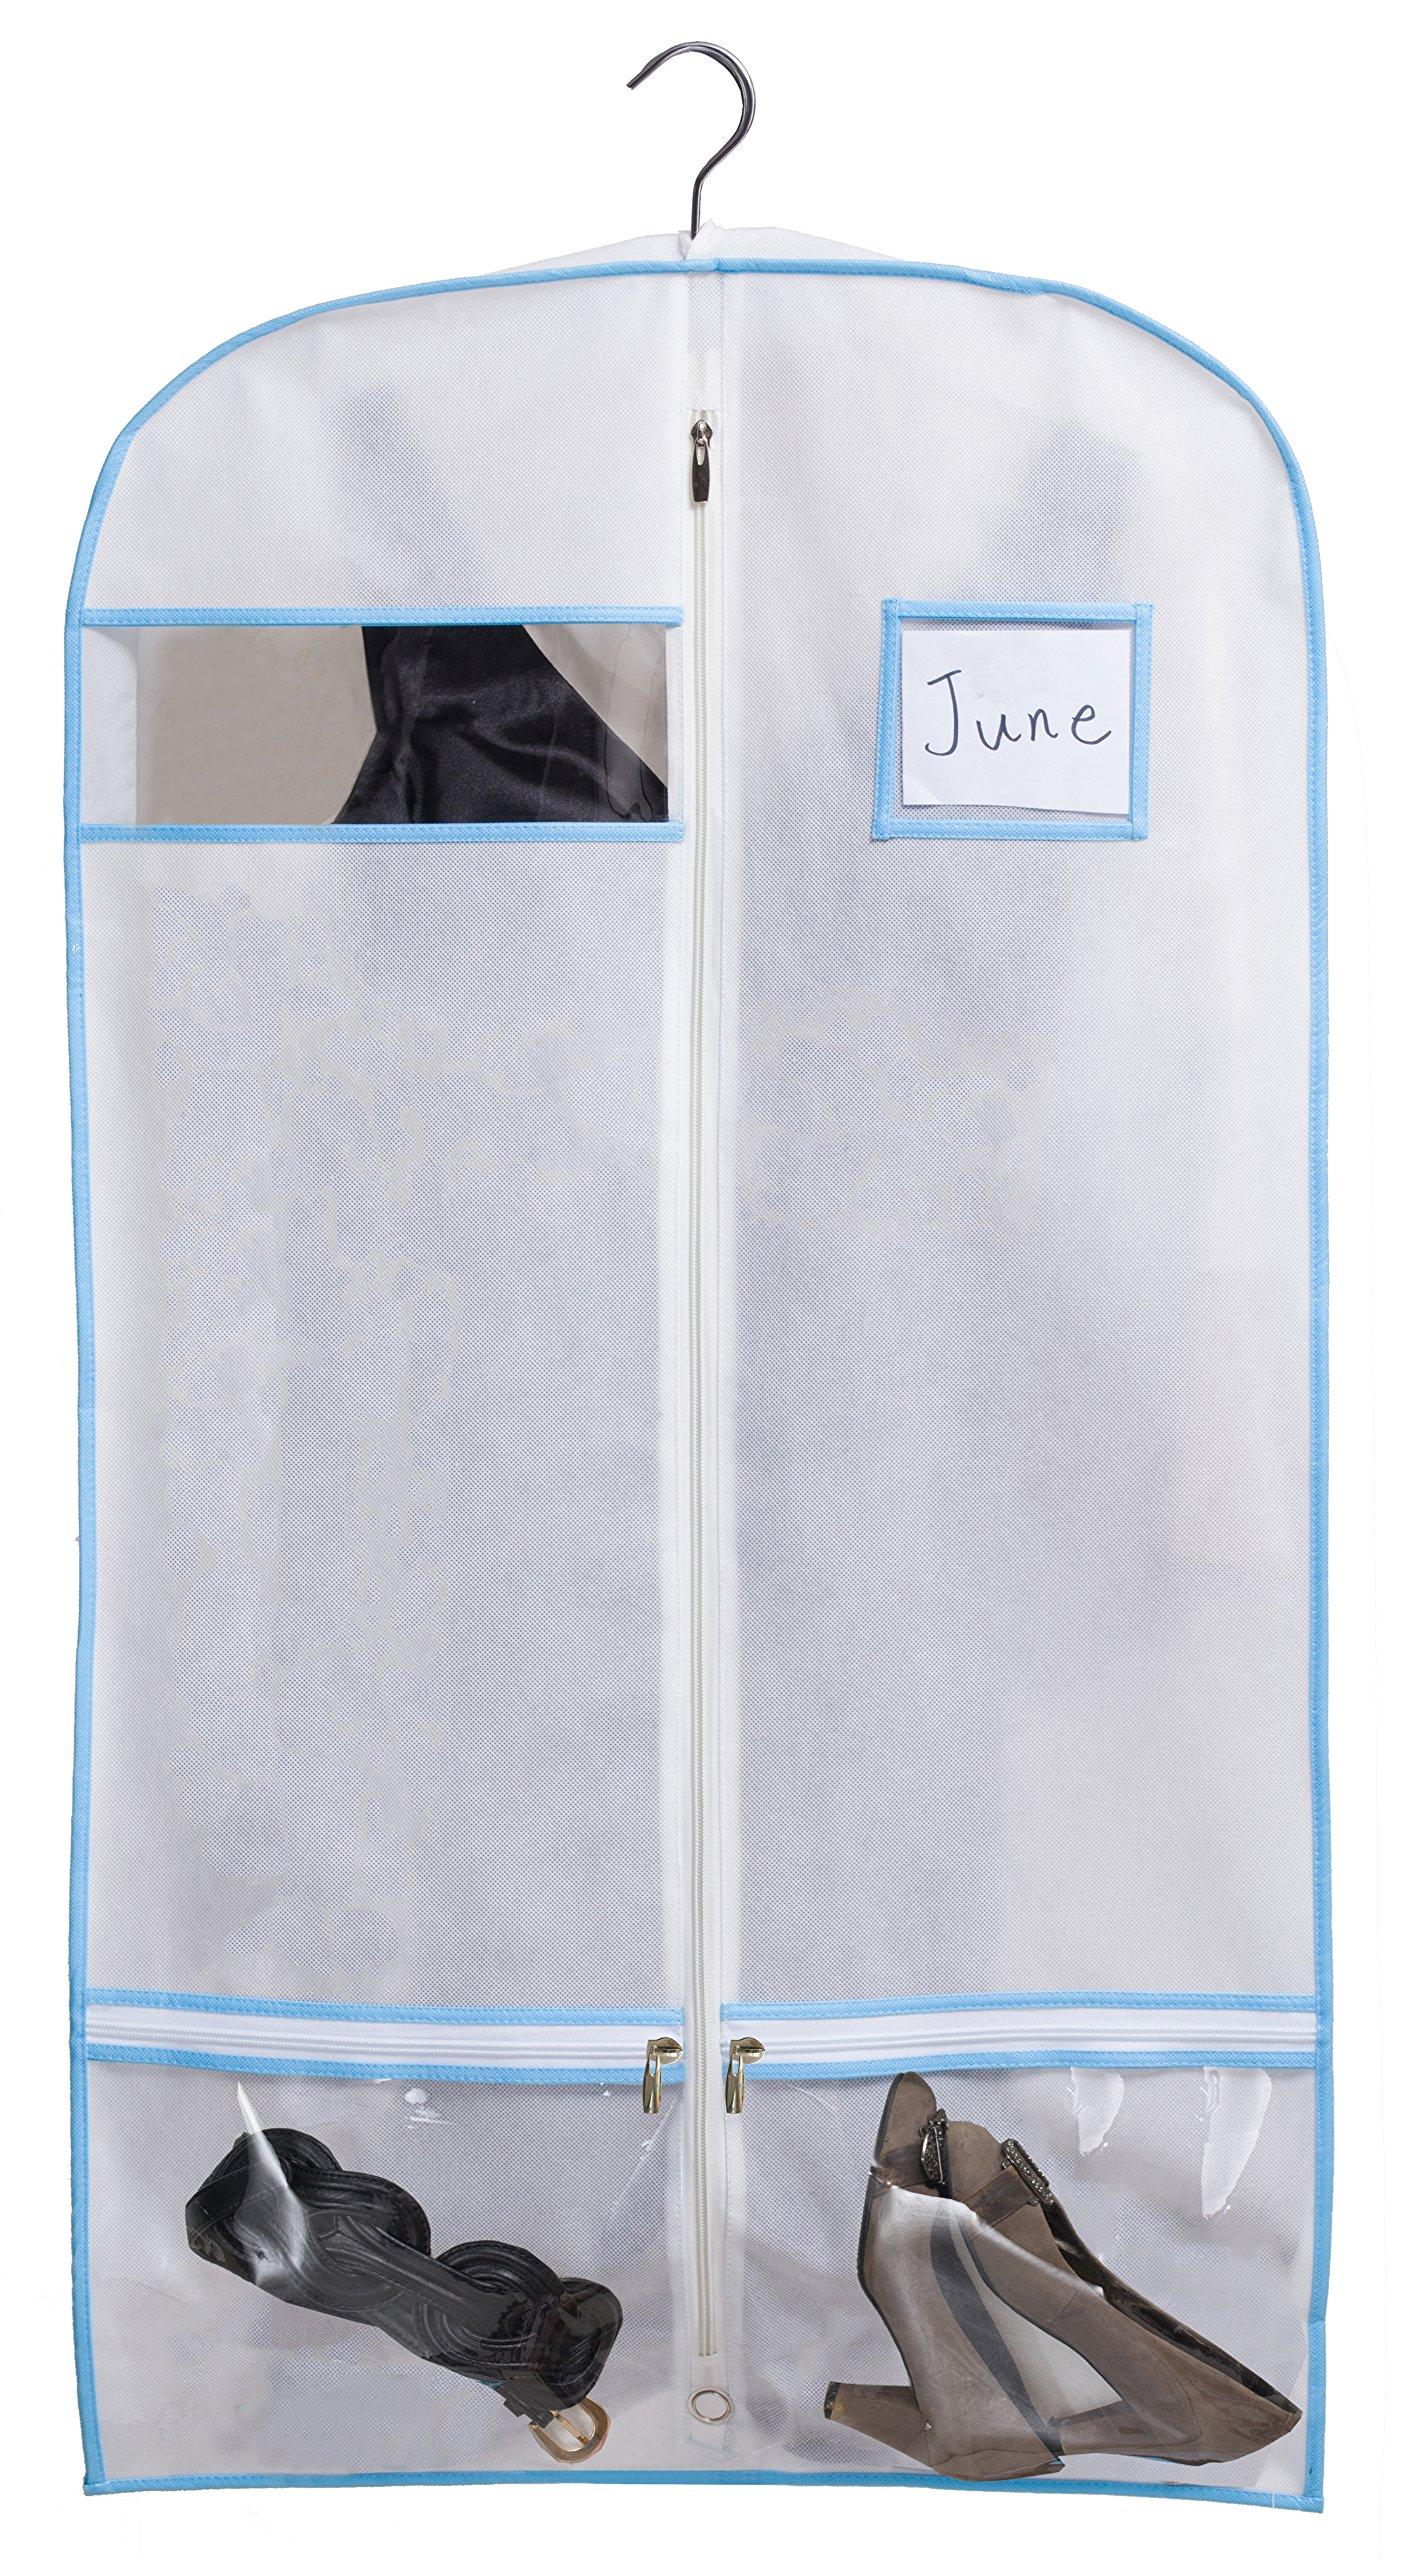 Kimbora 40'' Travel Dance/Dress Costume Garment Bag with Clear Accessories Zipper Pockets Suit Garment Cover (White) by KIMBORA (Image #3)